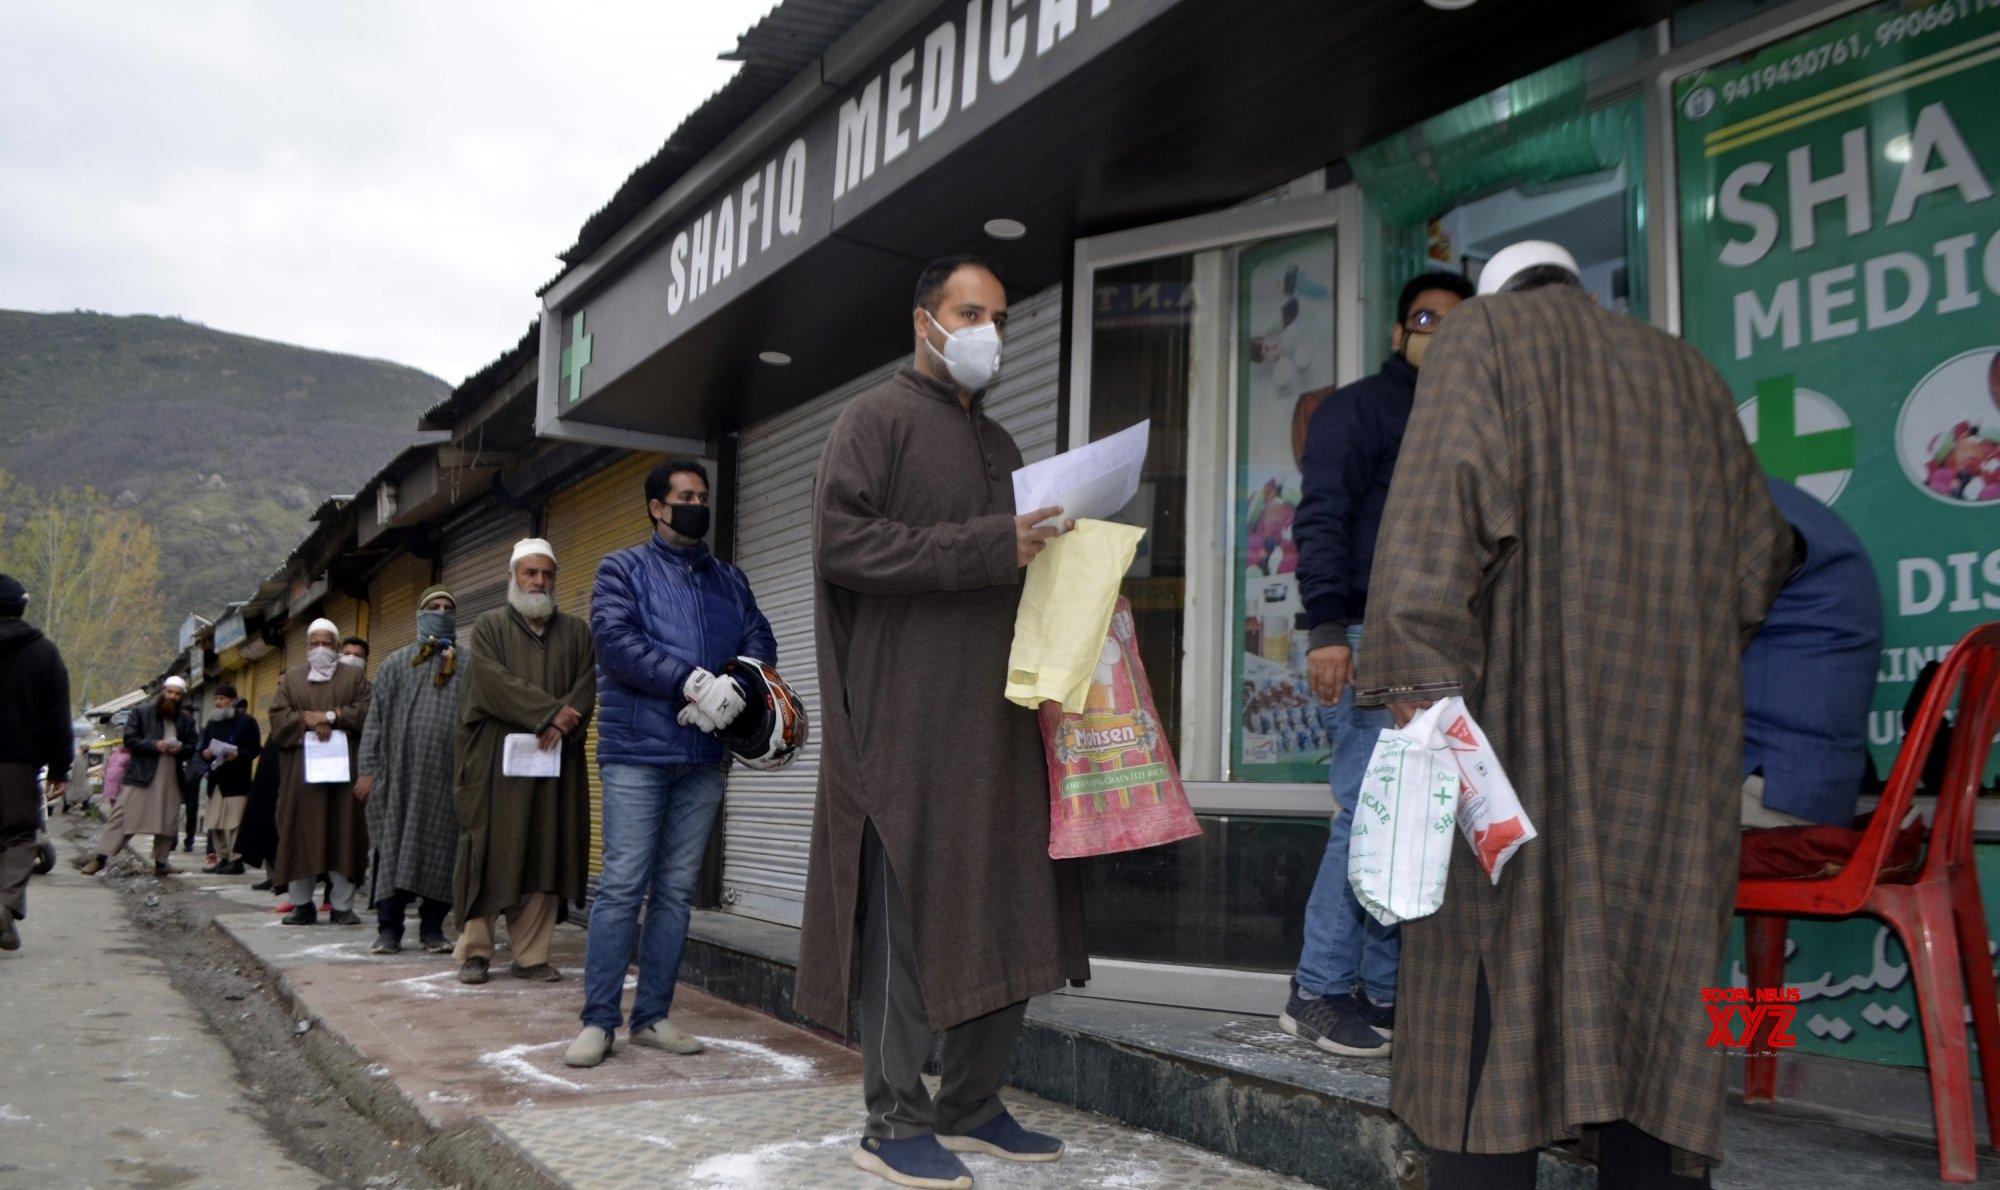 50 contacts of Kashmir's 1st COVID-19 victim quarantined